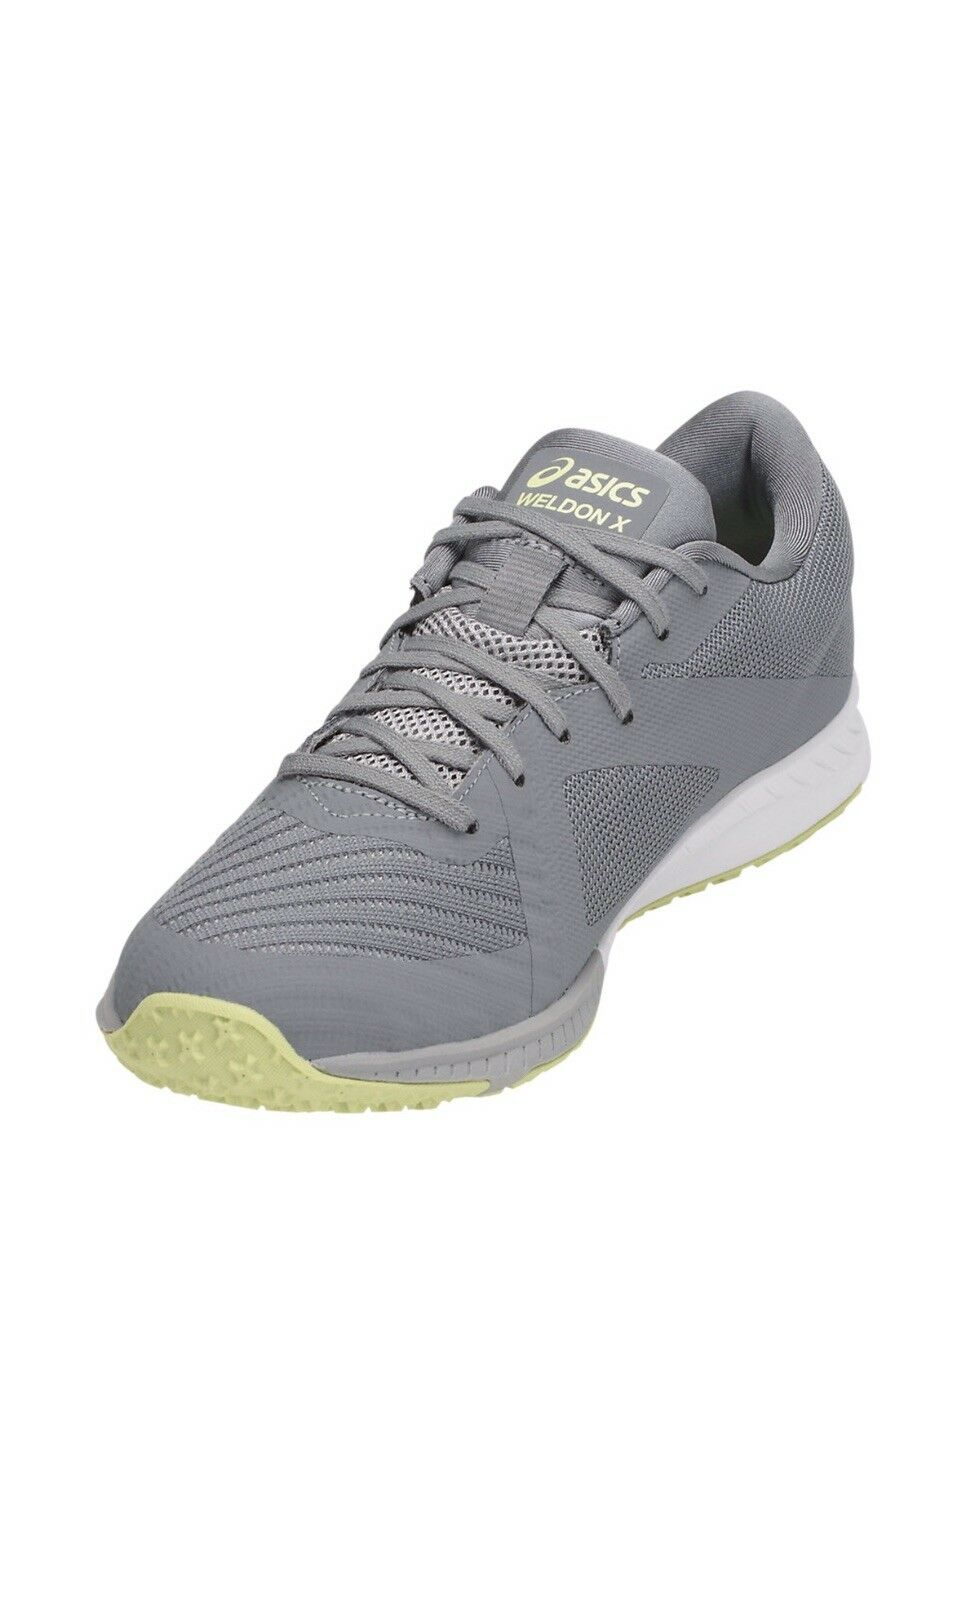 NWOB Asics Sneakers Tennis Running Running Running Flats shoes Size 12 12M 12B NEW c8a936